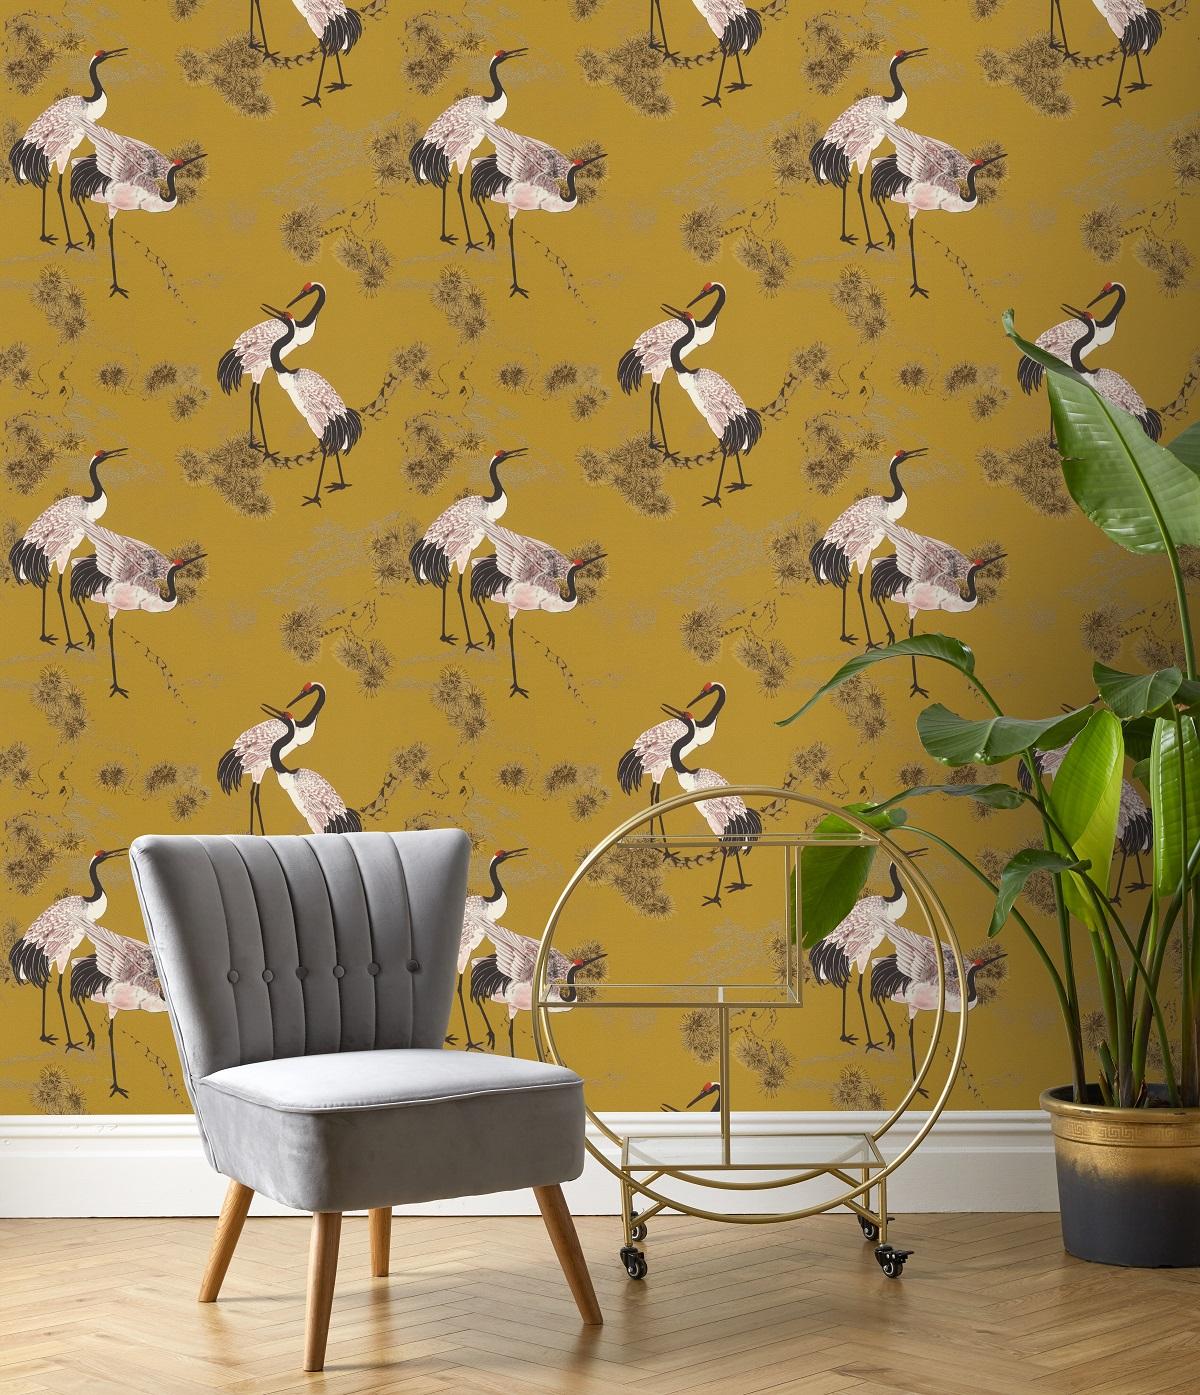 Papel pintado vinílico animales Garzas Mostaza amarillo